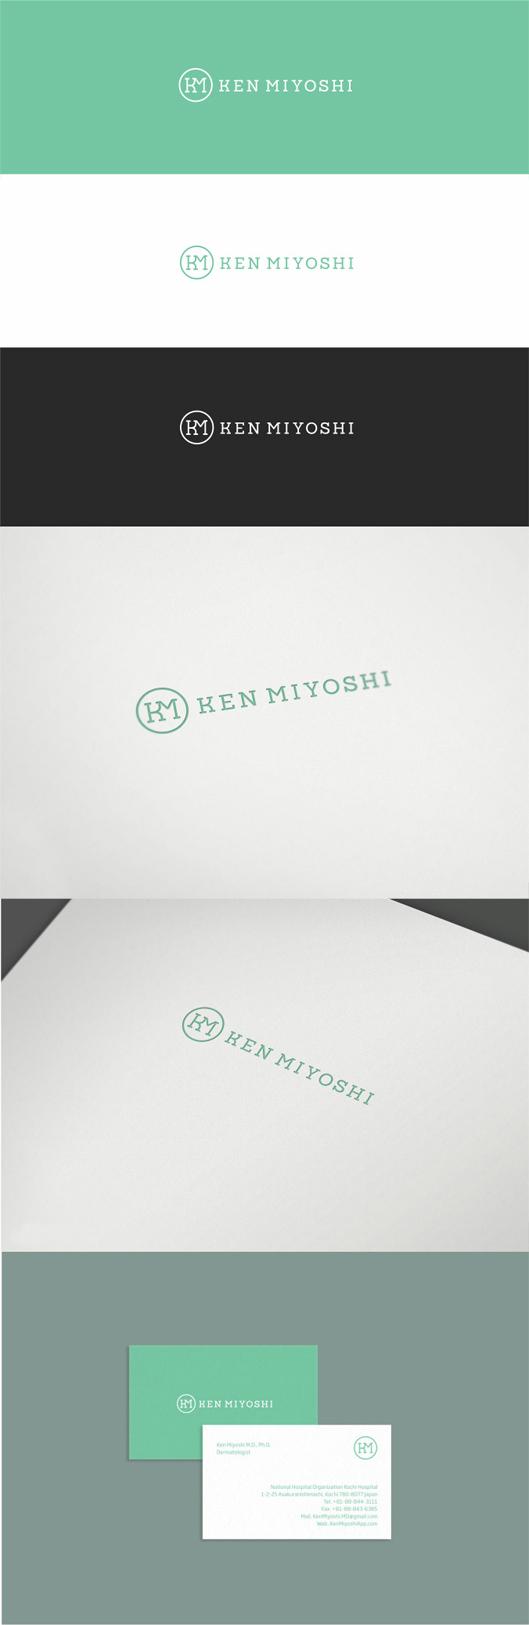 Ken Miyoshi, dermatology, dermatologist, medic, medical, doctor, medicine, logo, design, logo design, identity, branding